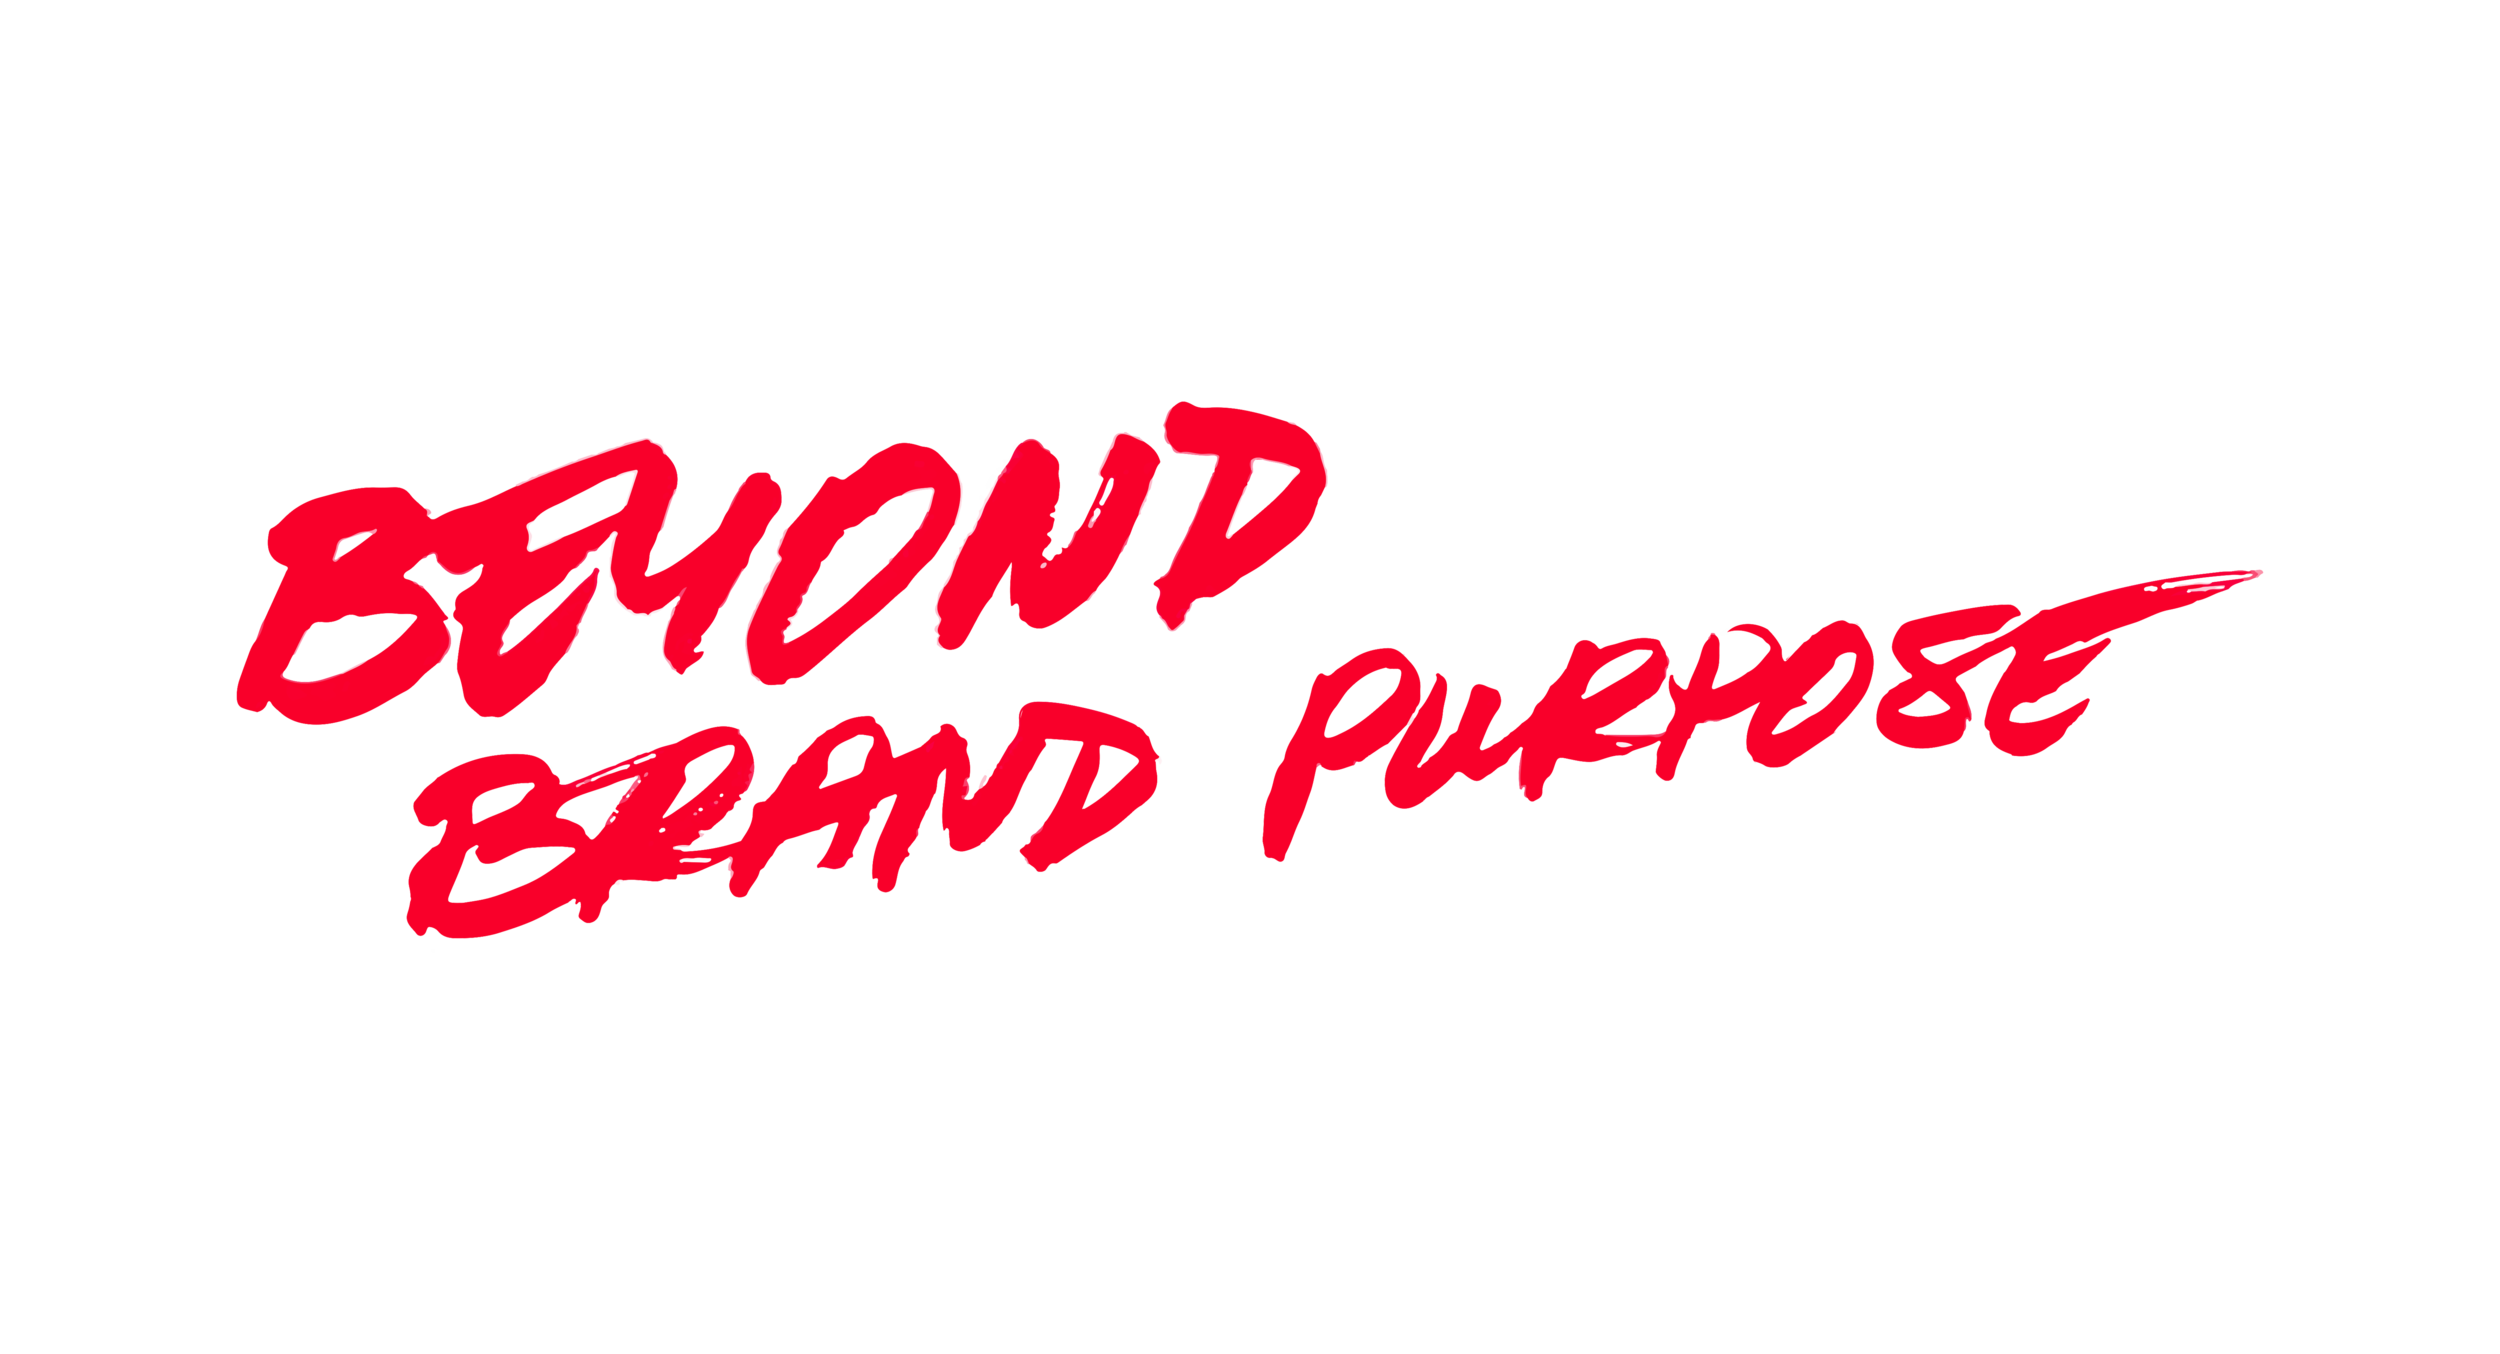 beyondbrand.png